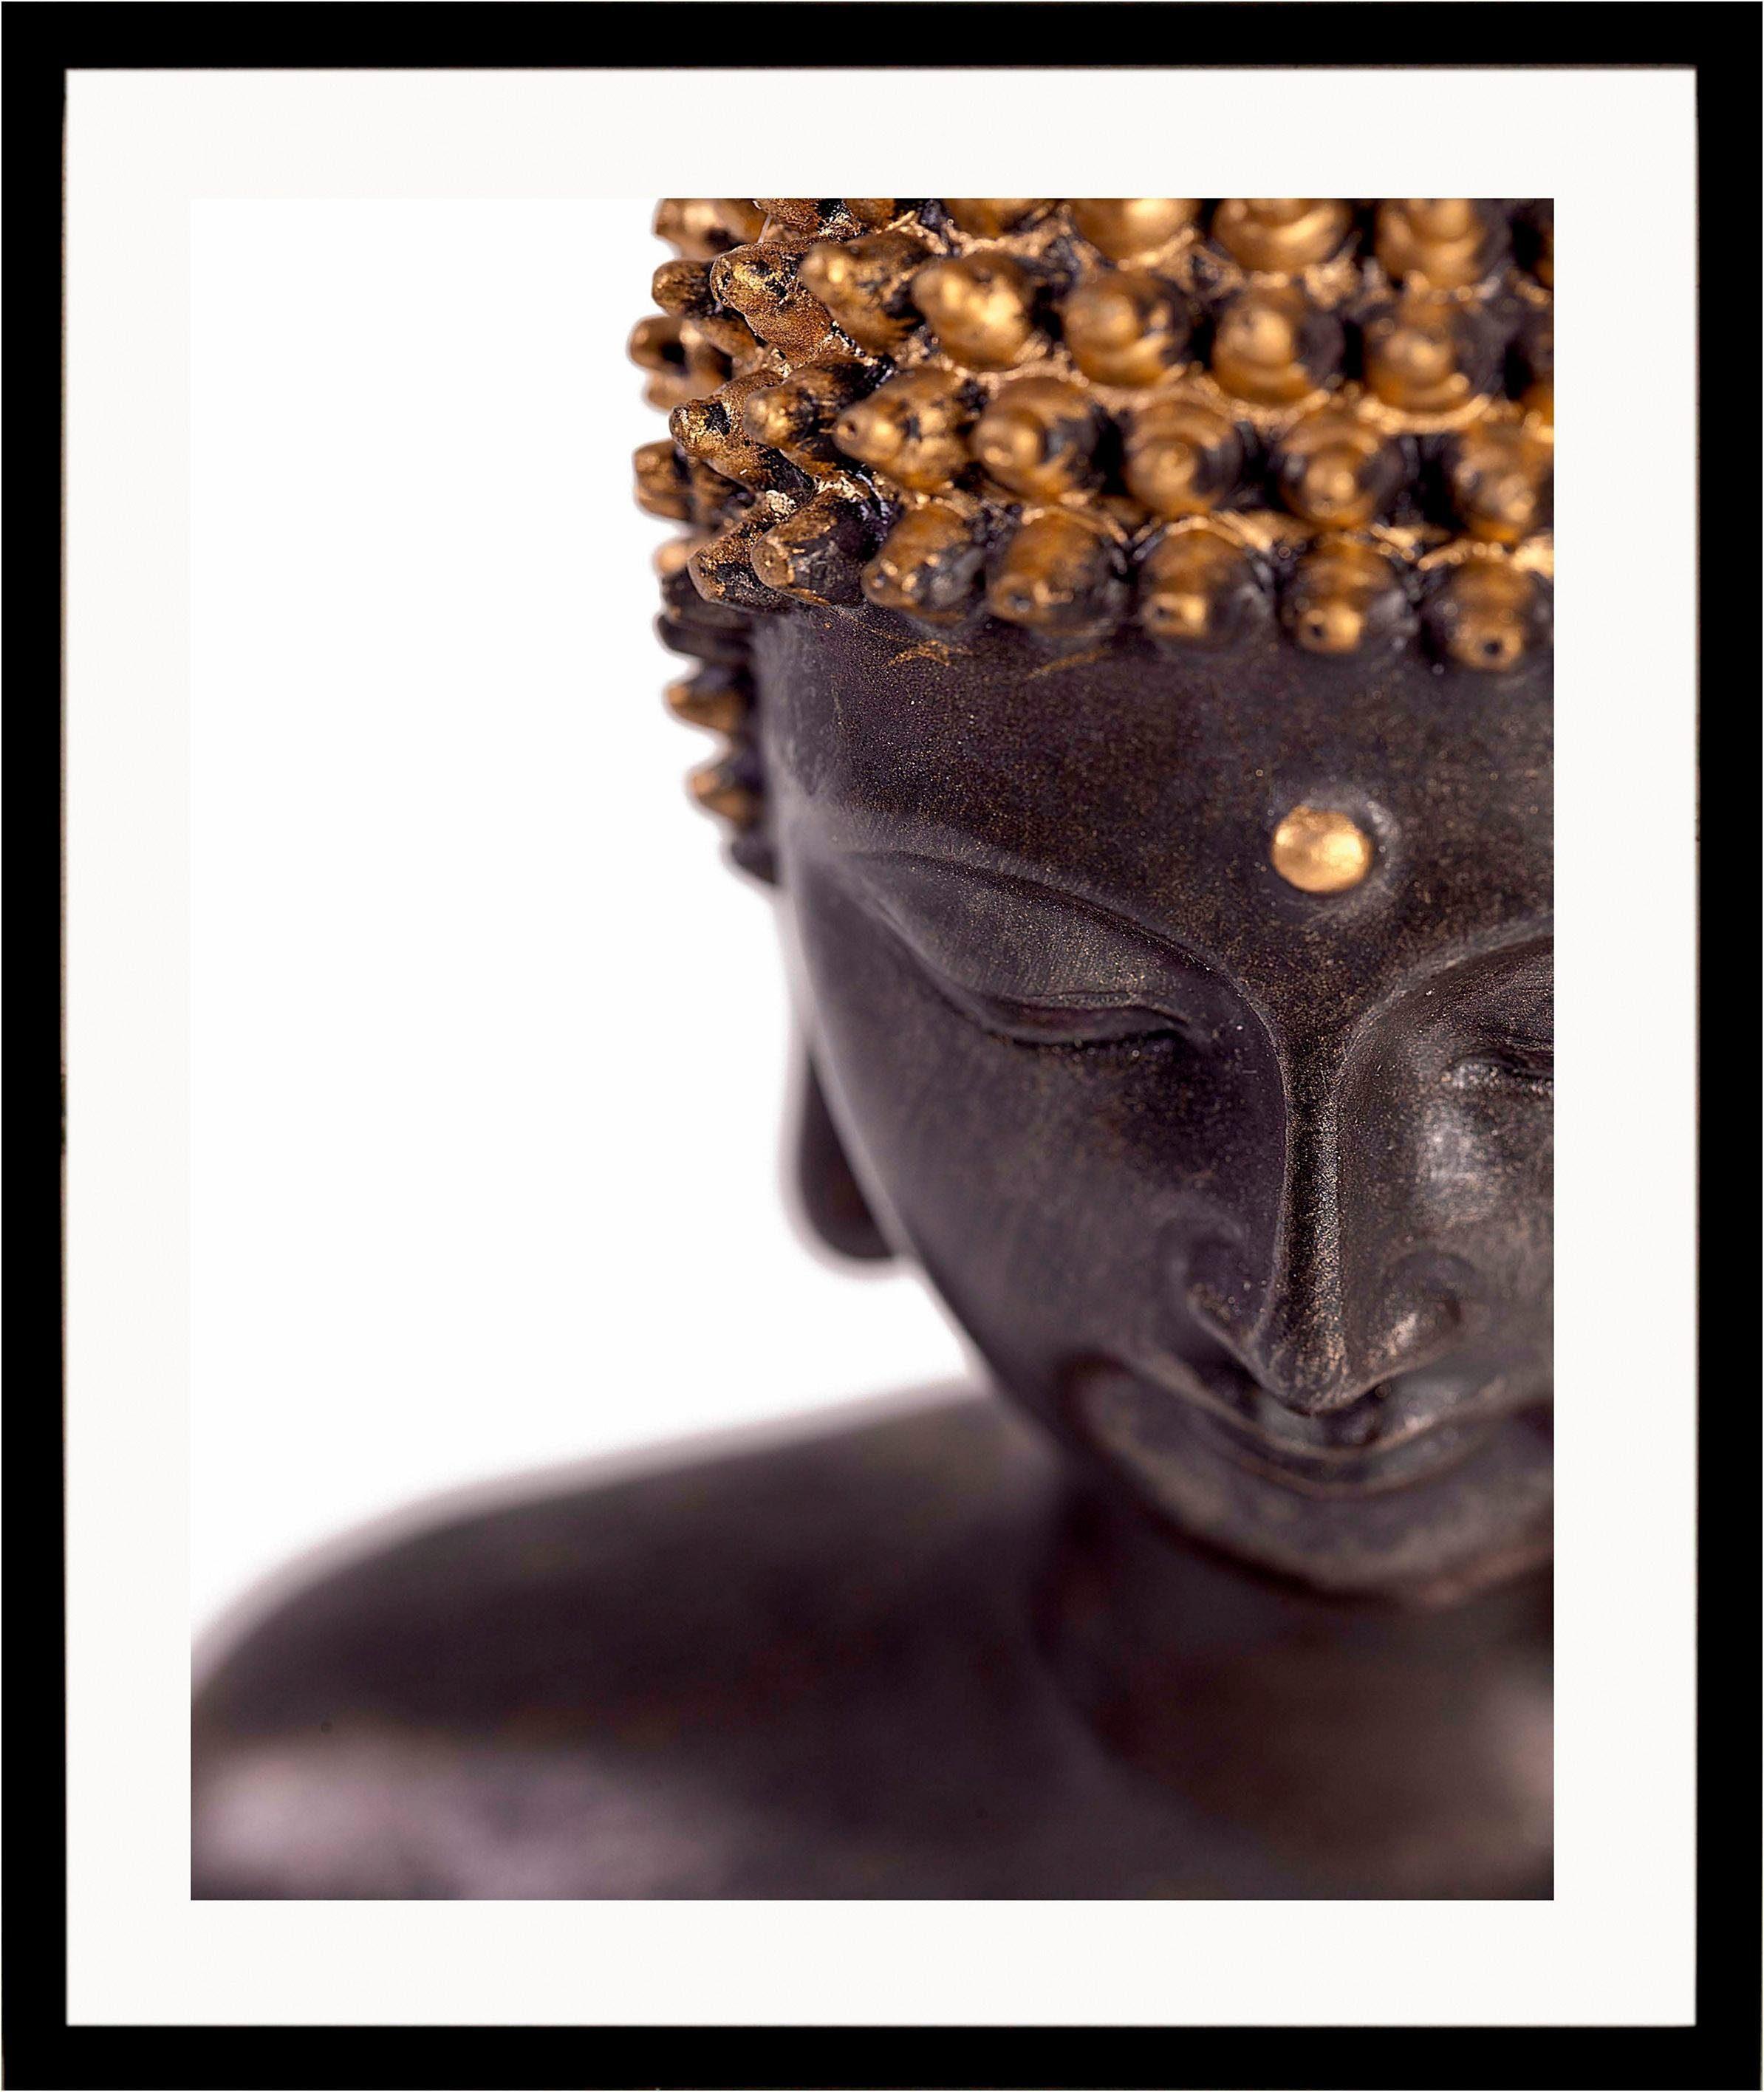 G&C gerahmter Kunstdruck »Buddha« front, 43/53 cm